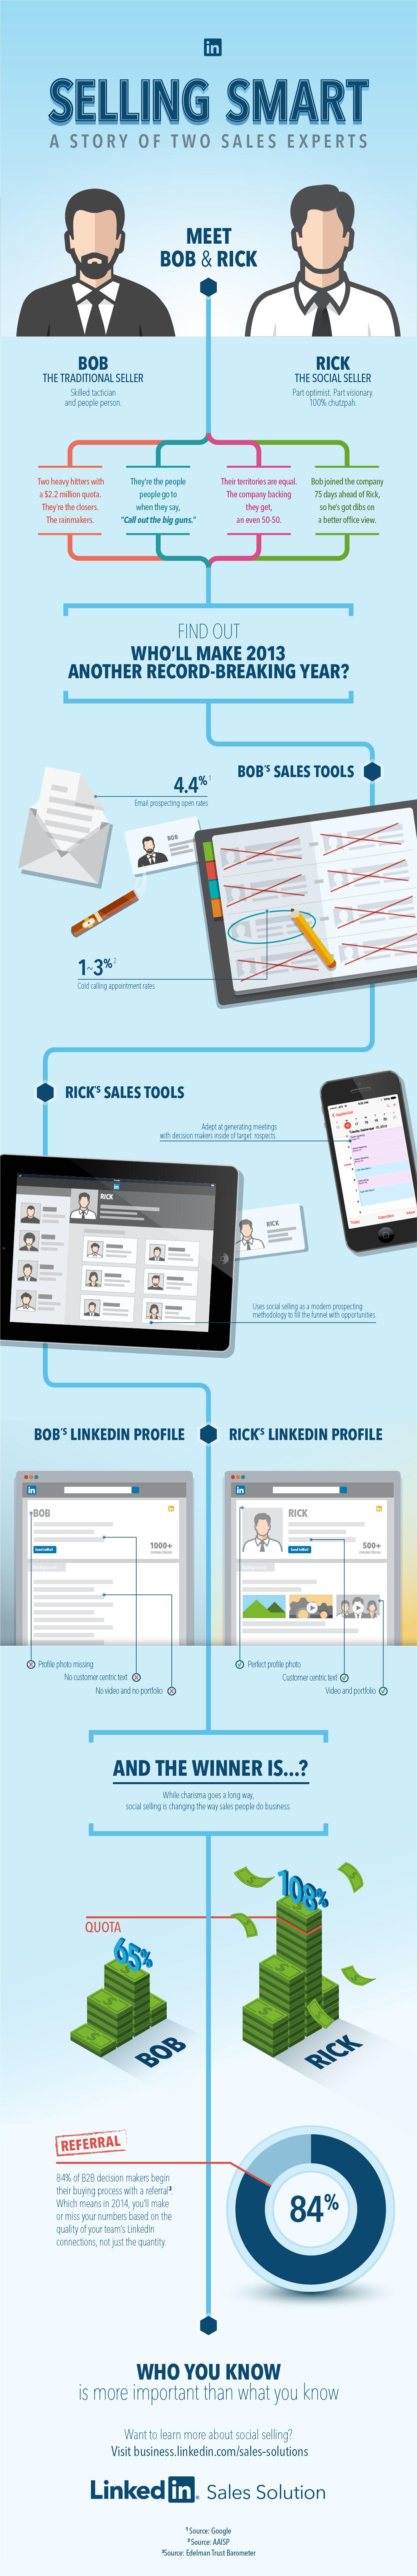 SBI-LinkedIn-SocialSelling